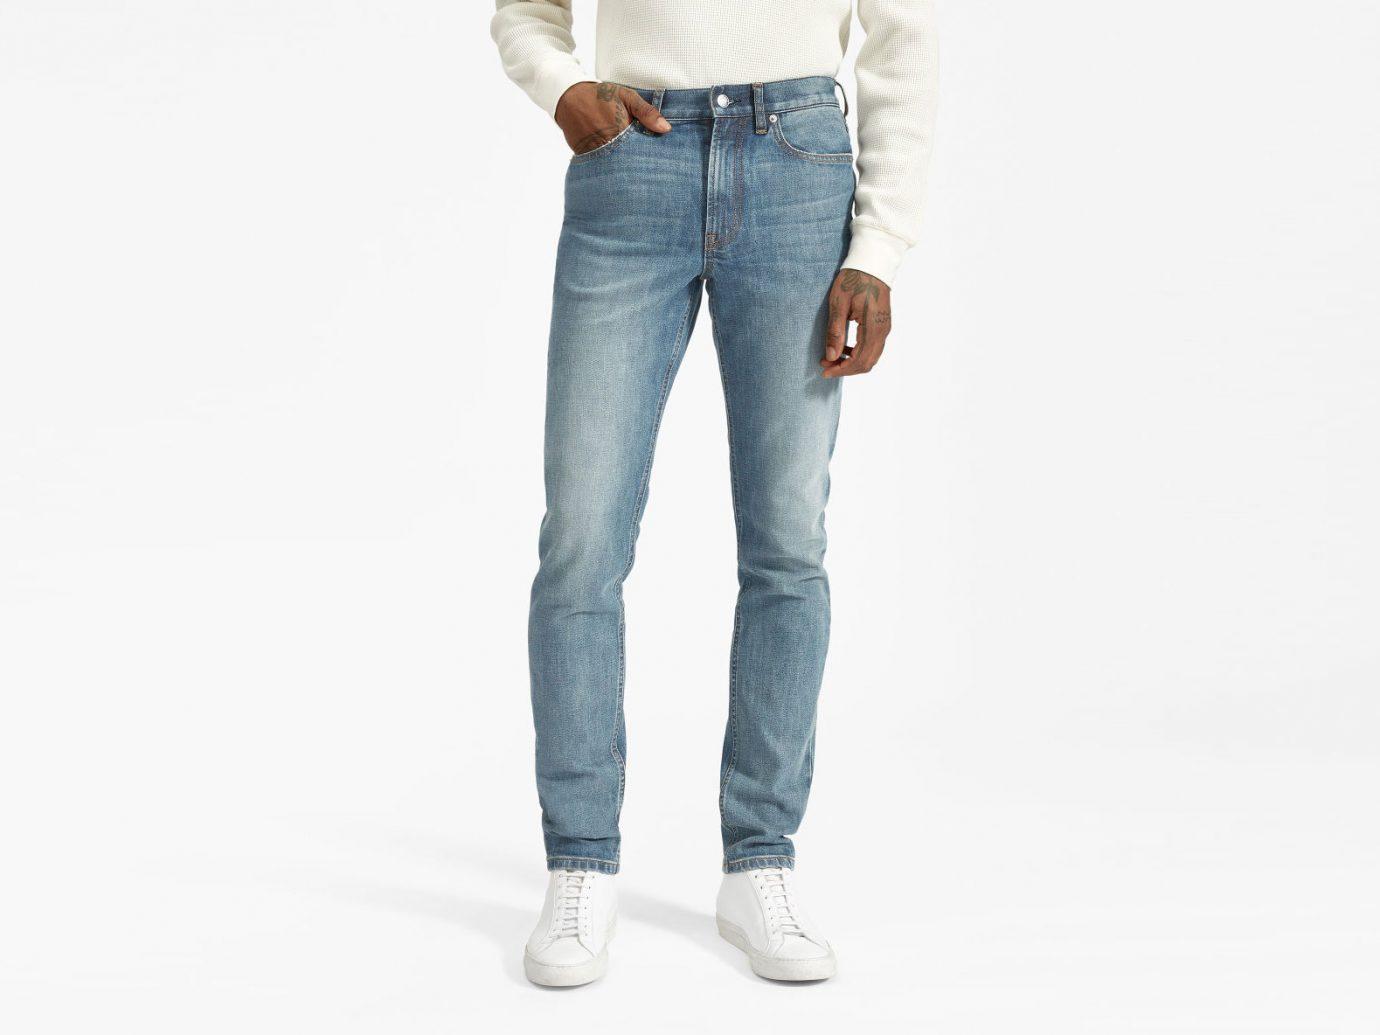 Everlane The Slim Fit Jean